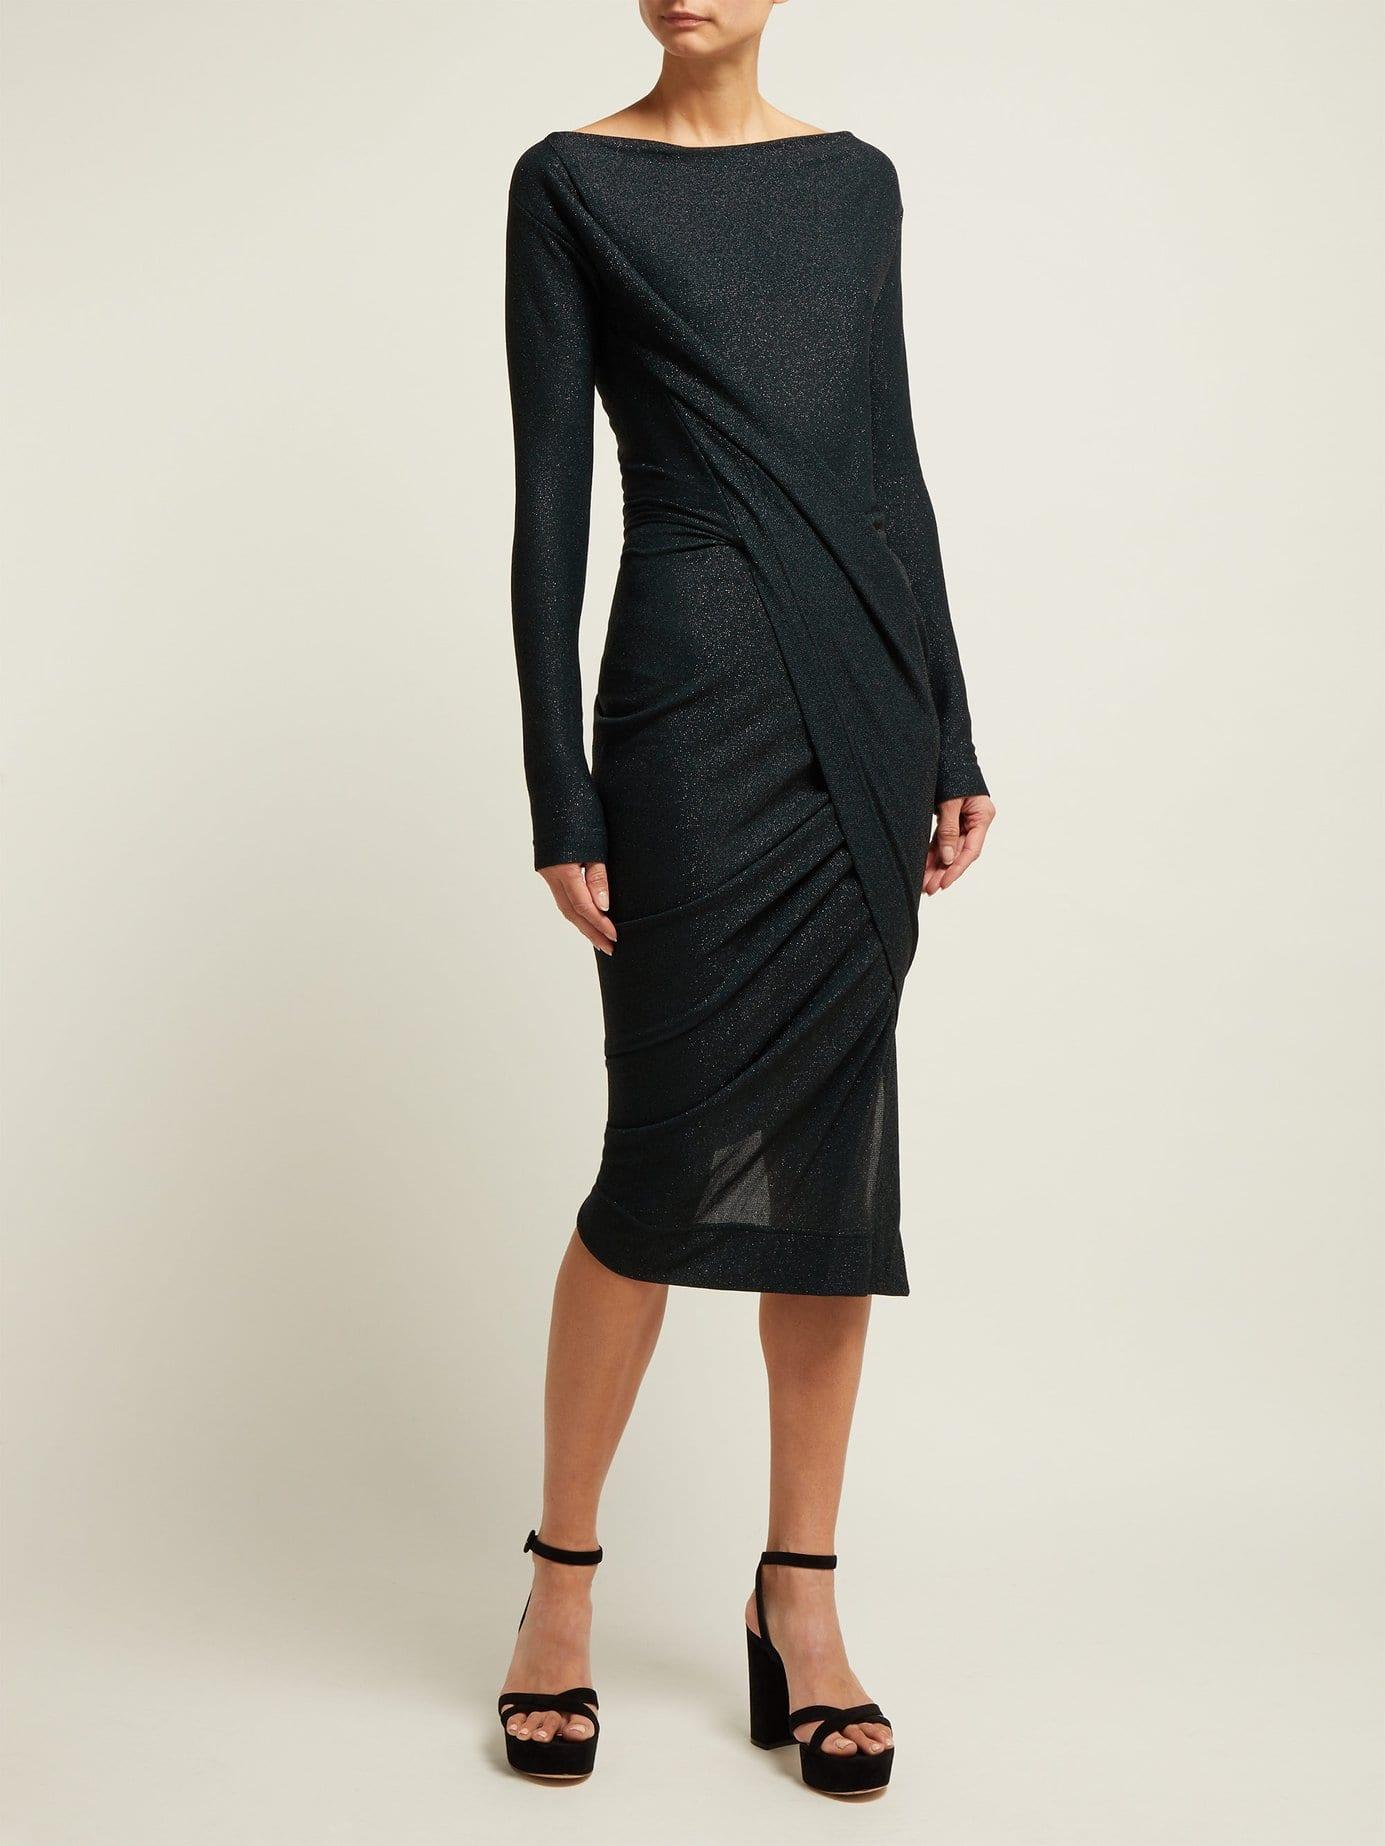 a43f1343140 VIVIENNE WESTWOOD ANGLOMANIA Vian Draped Asymmetric Midi Dark Green Dress